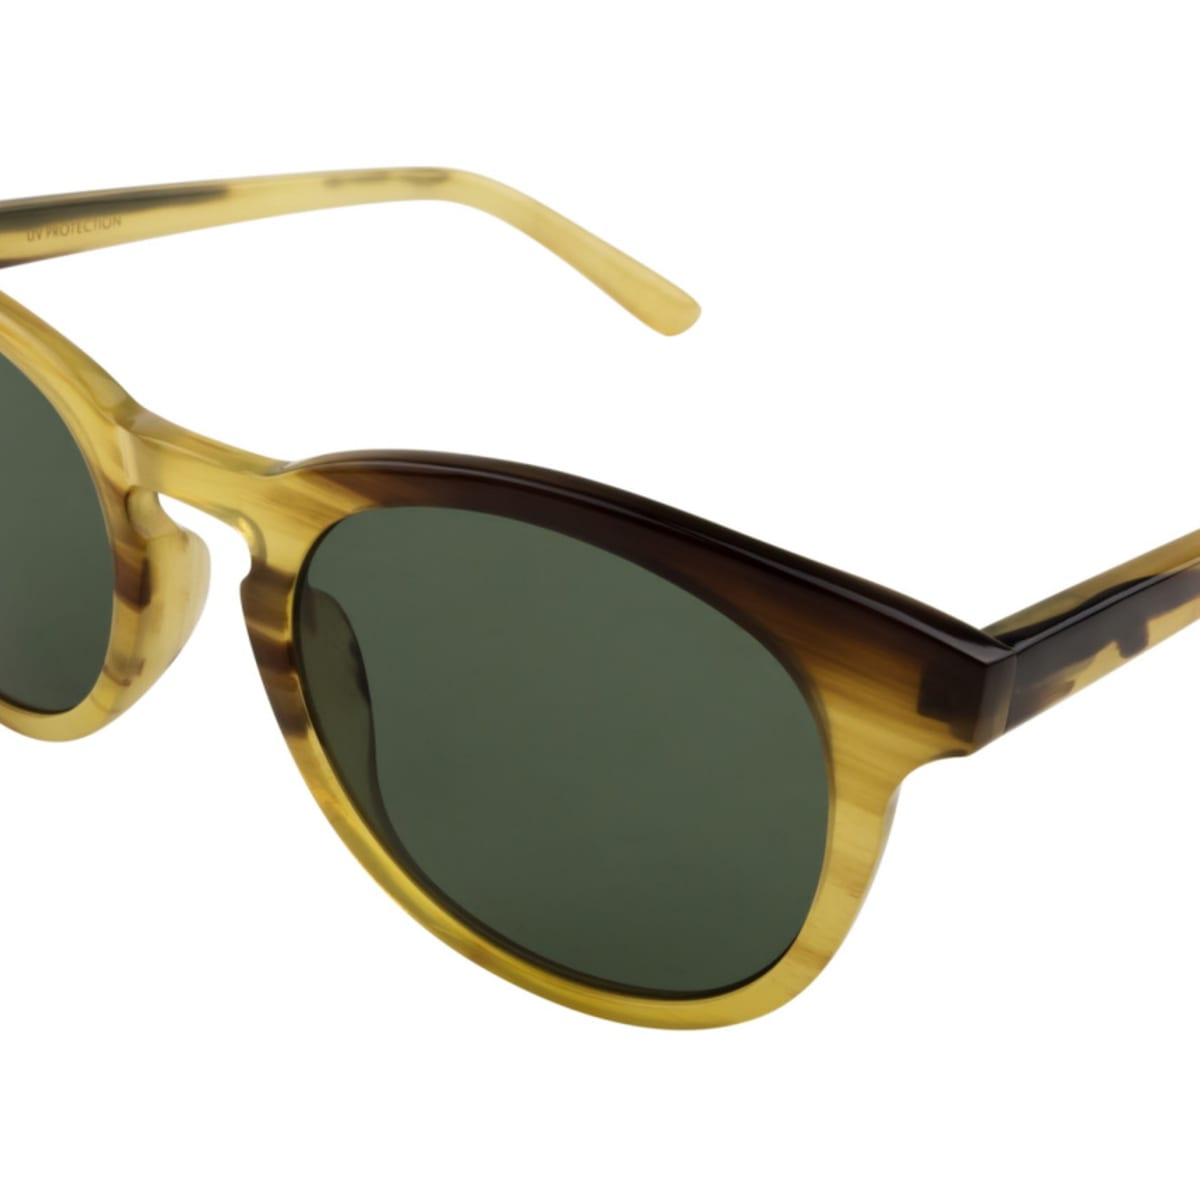 foto de Kent Wang's exotic (and accessible) Horn sunglasses - Acquire